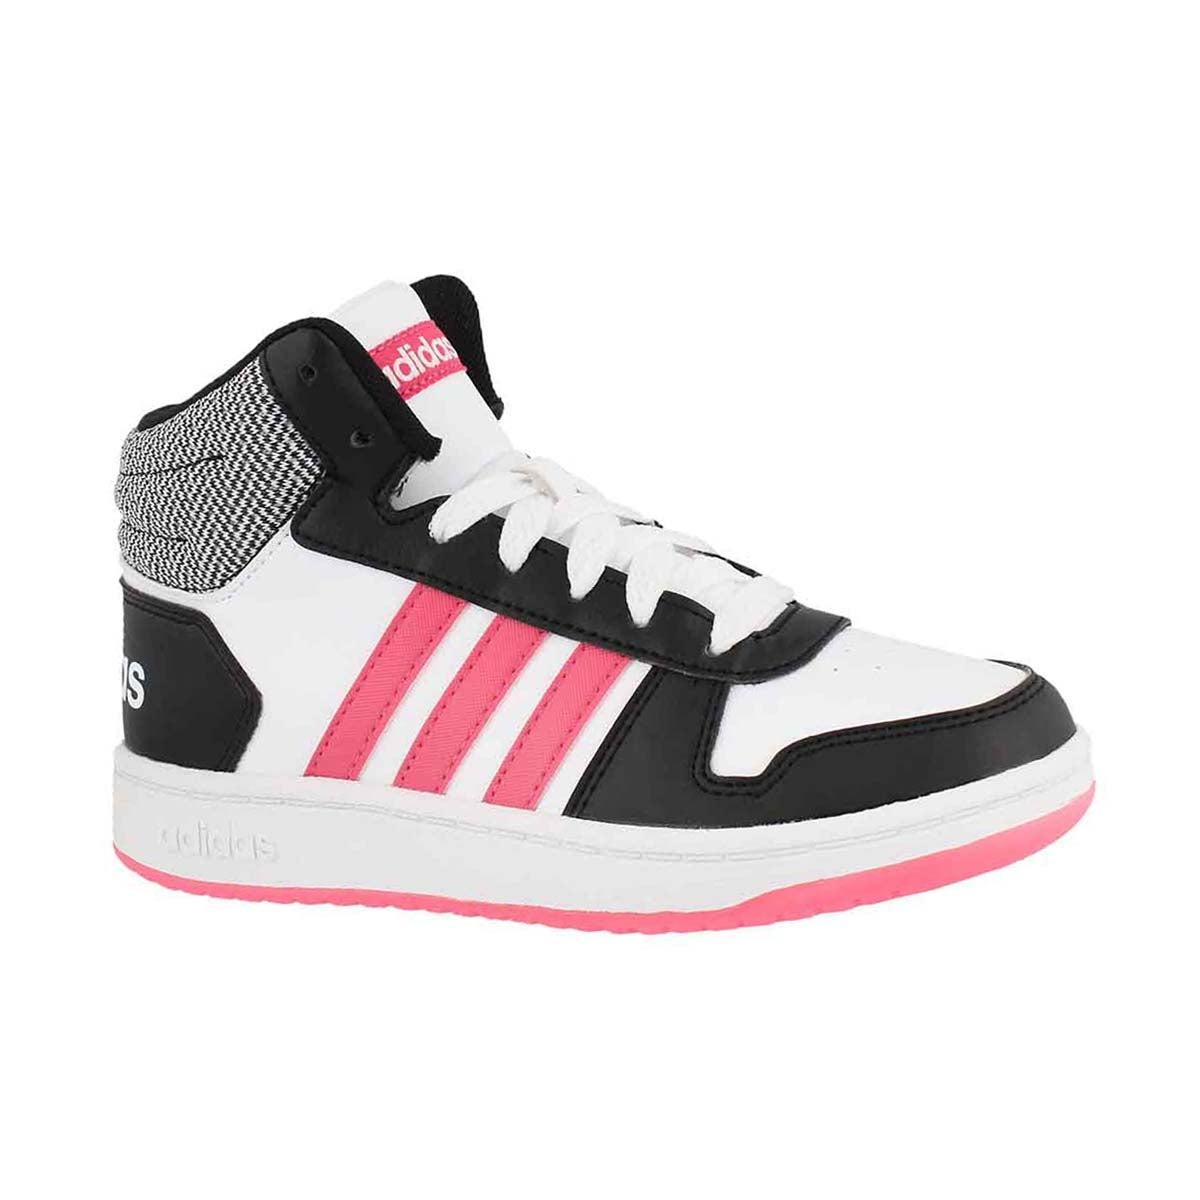 Girls' V5 HOOPS MID 2.0 white/pink/black sneakers